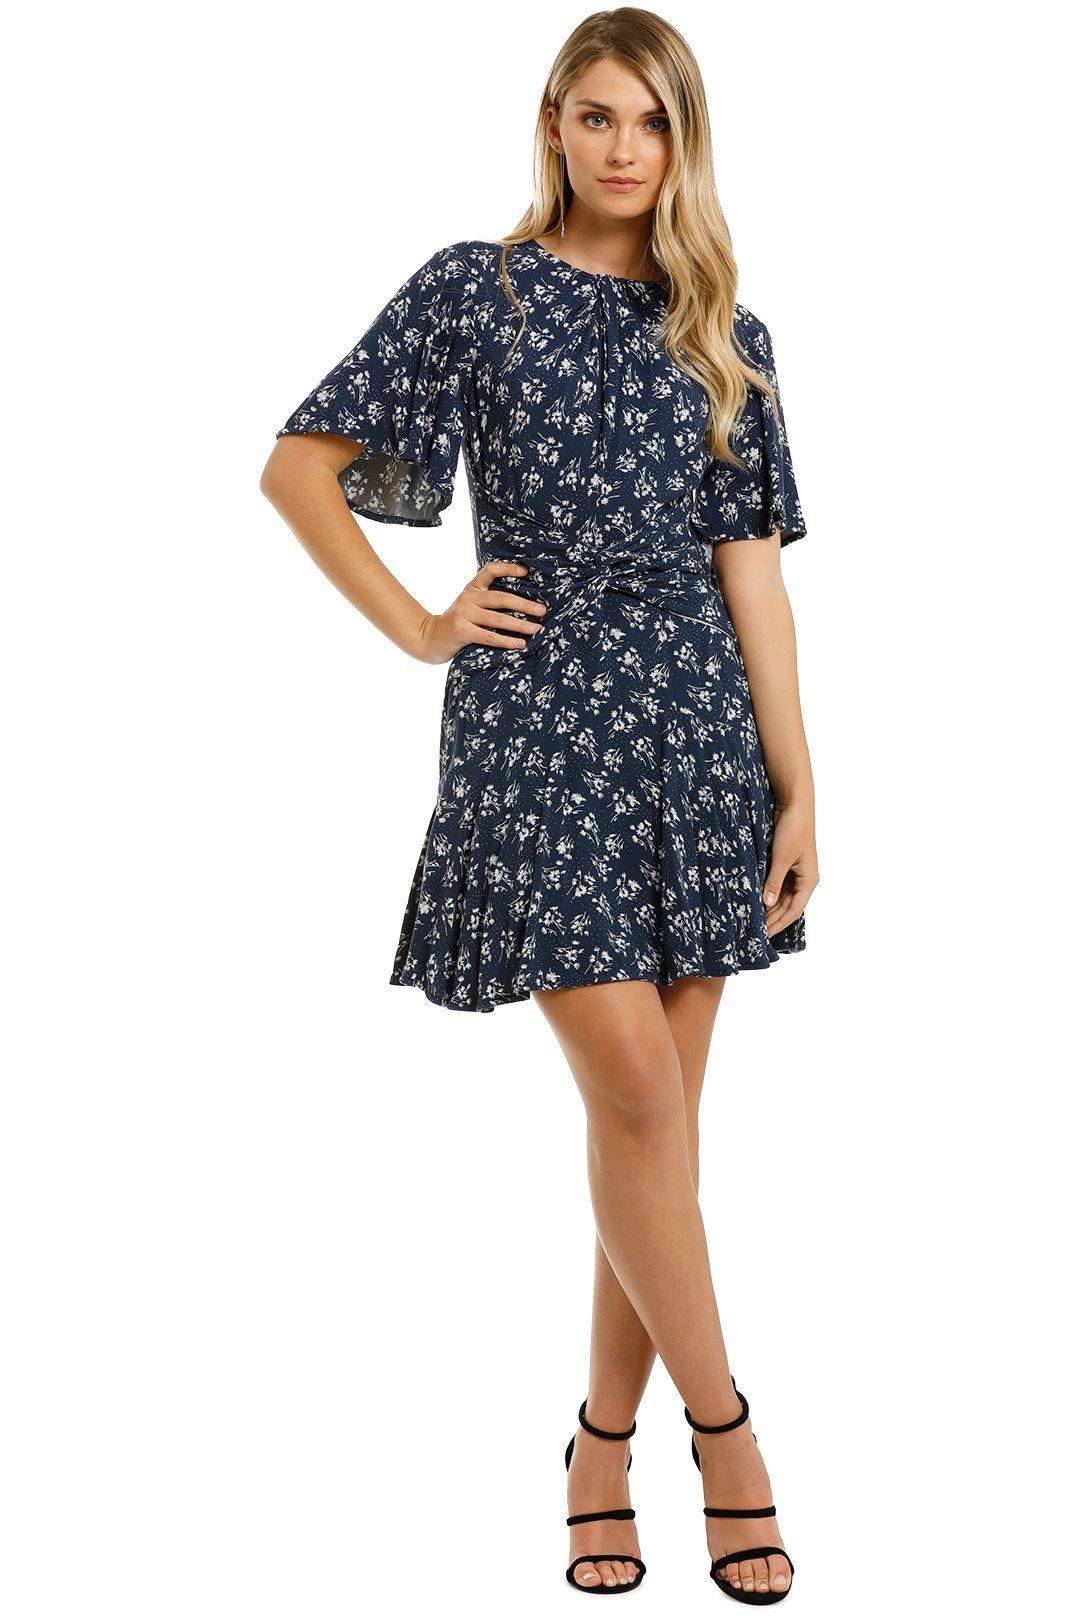 Lover-Mimosa-Mini-Dress-Navy-Front